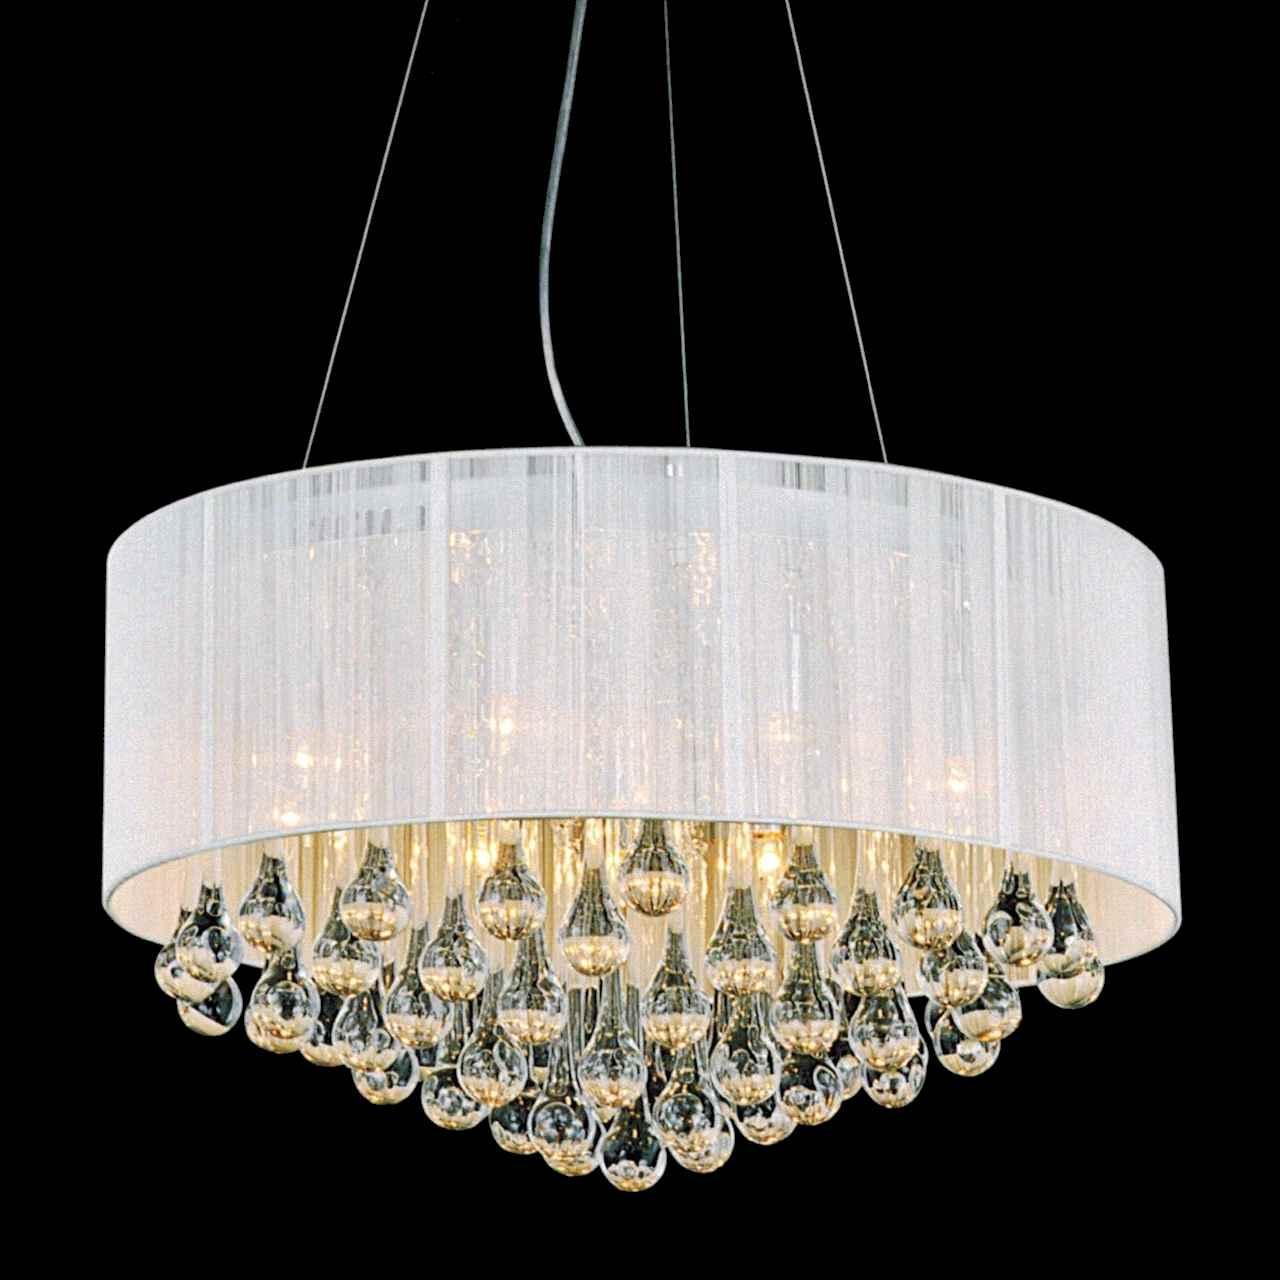 Contemporary Chandelier Design Ideas Inspiration Home Designs Regarding Contemporary Chandelier (Image 8 of 15)